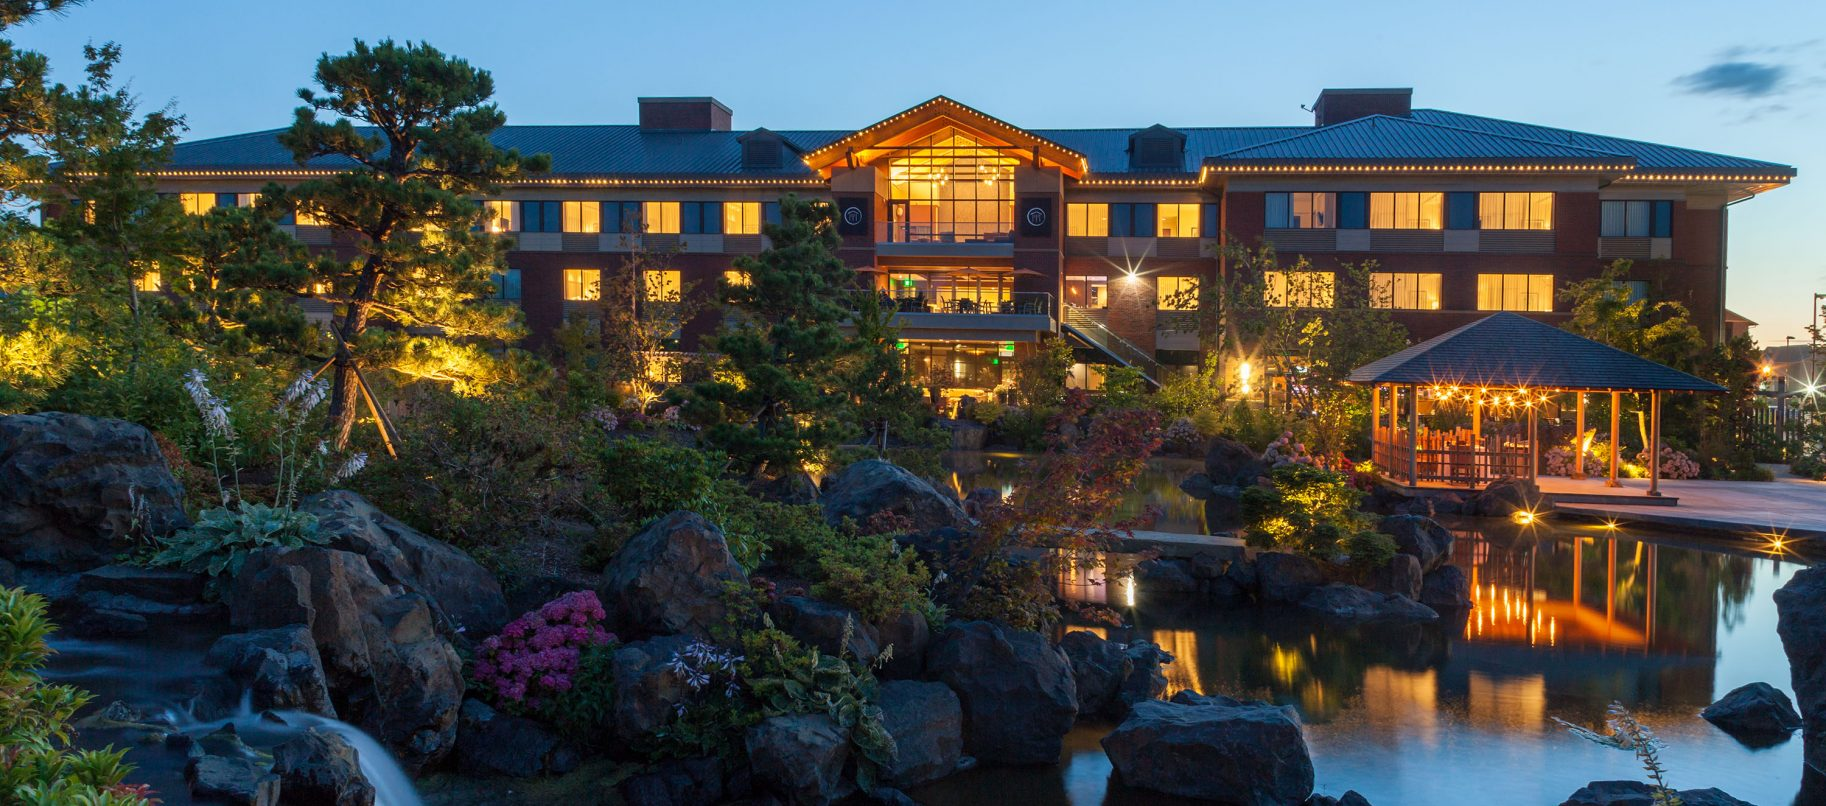 Best Restaurants In Lebanon Oregon